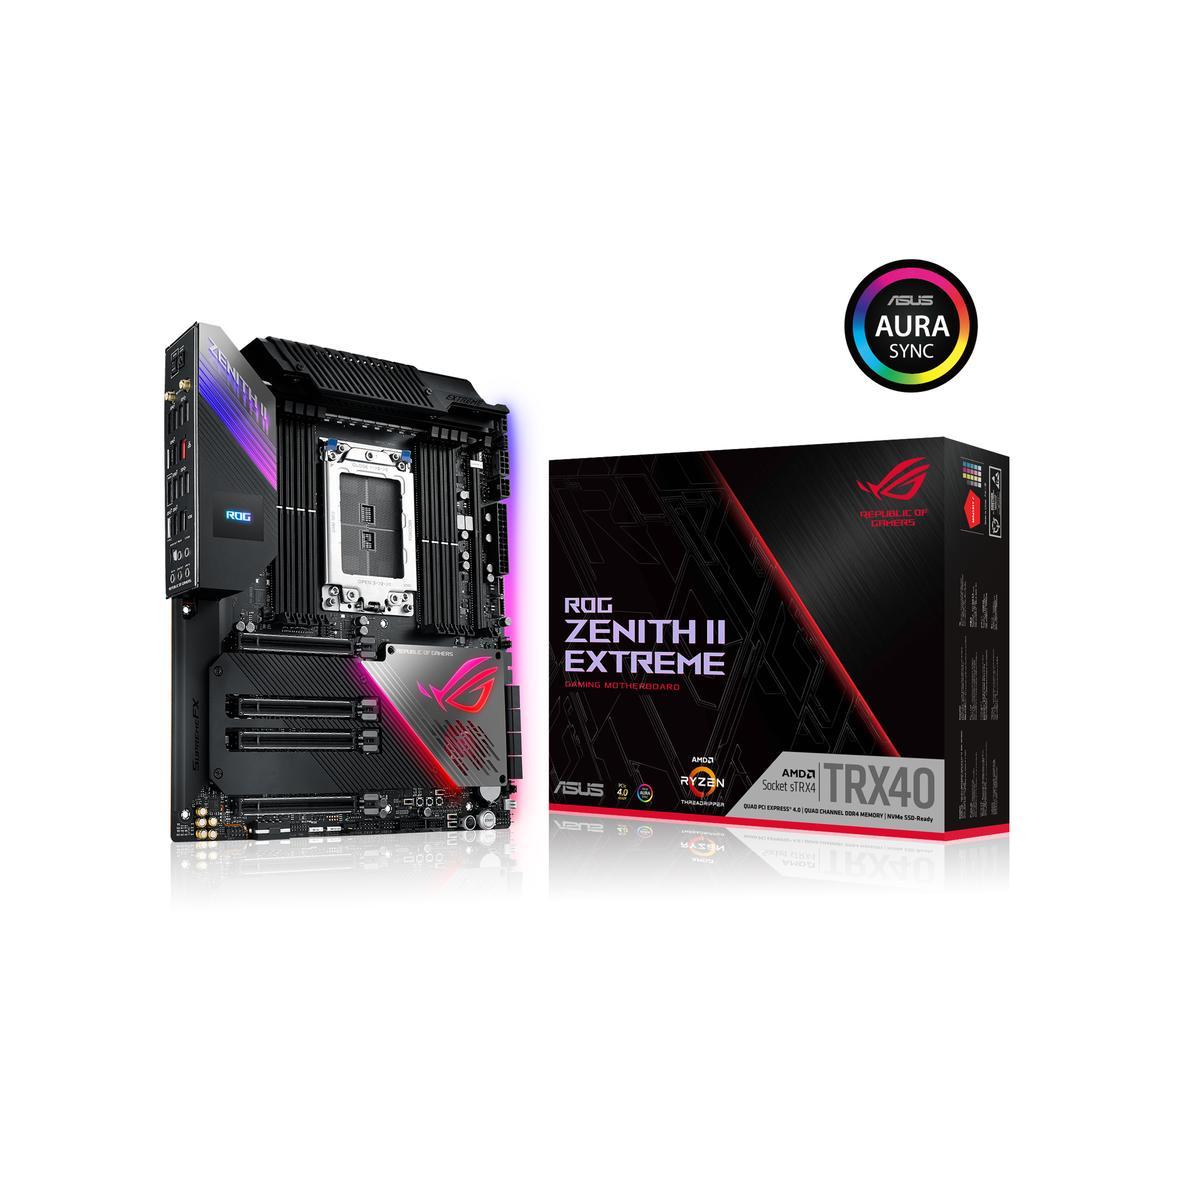 Asus Zenith II Extreme EATX sTRX4 Motherboard